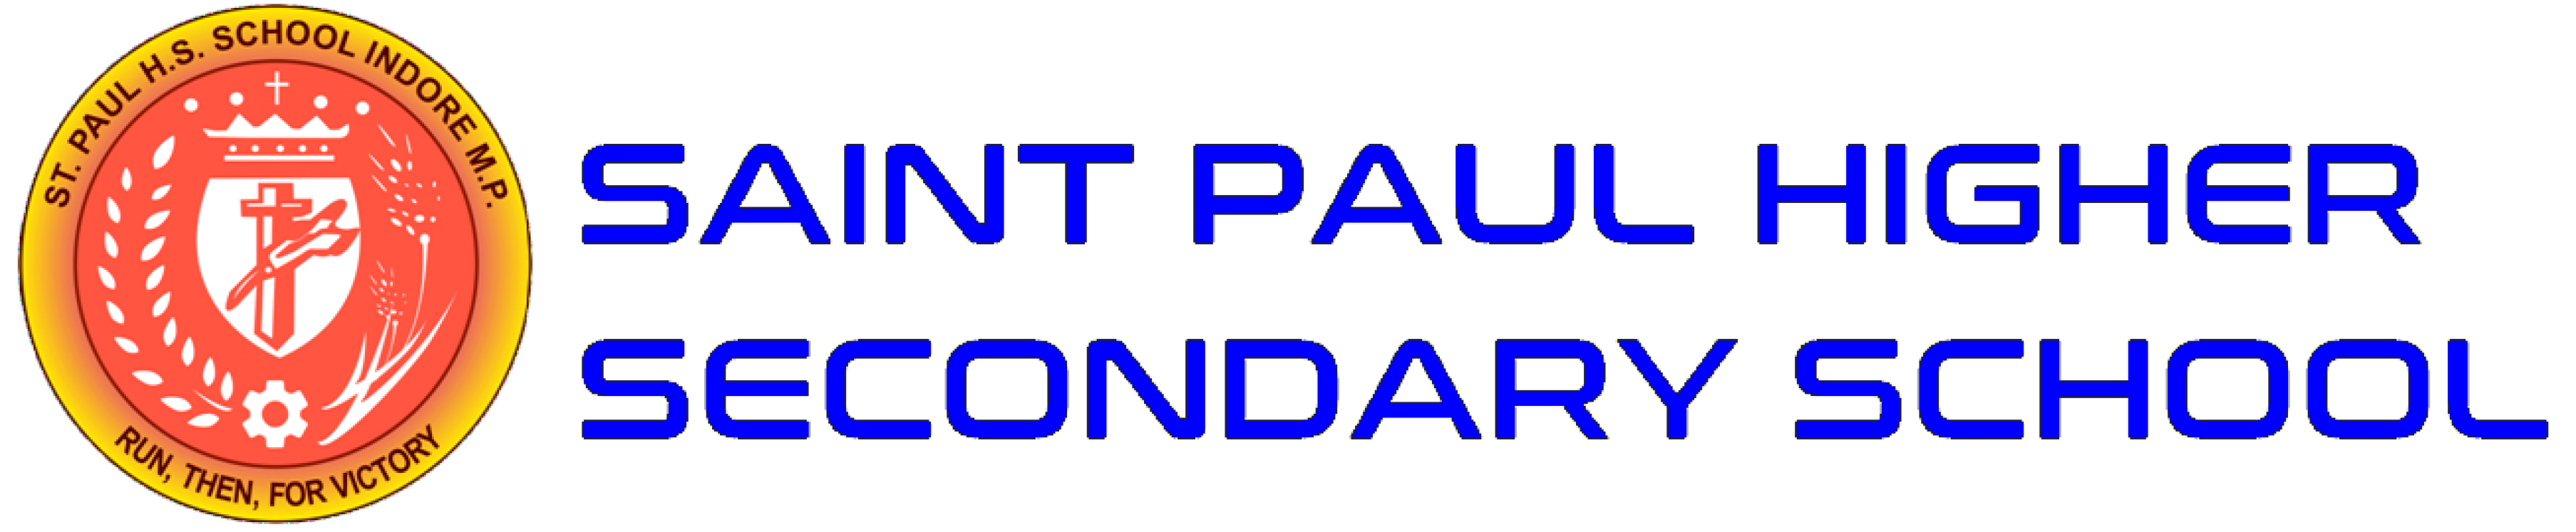 ST. PAUL HIGHER SECONDARY SCHOOL